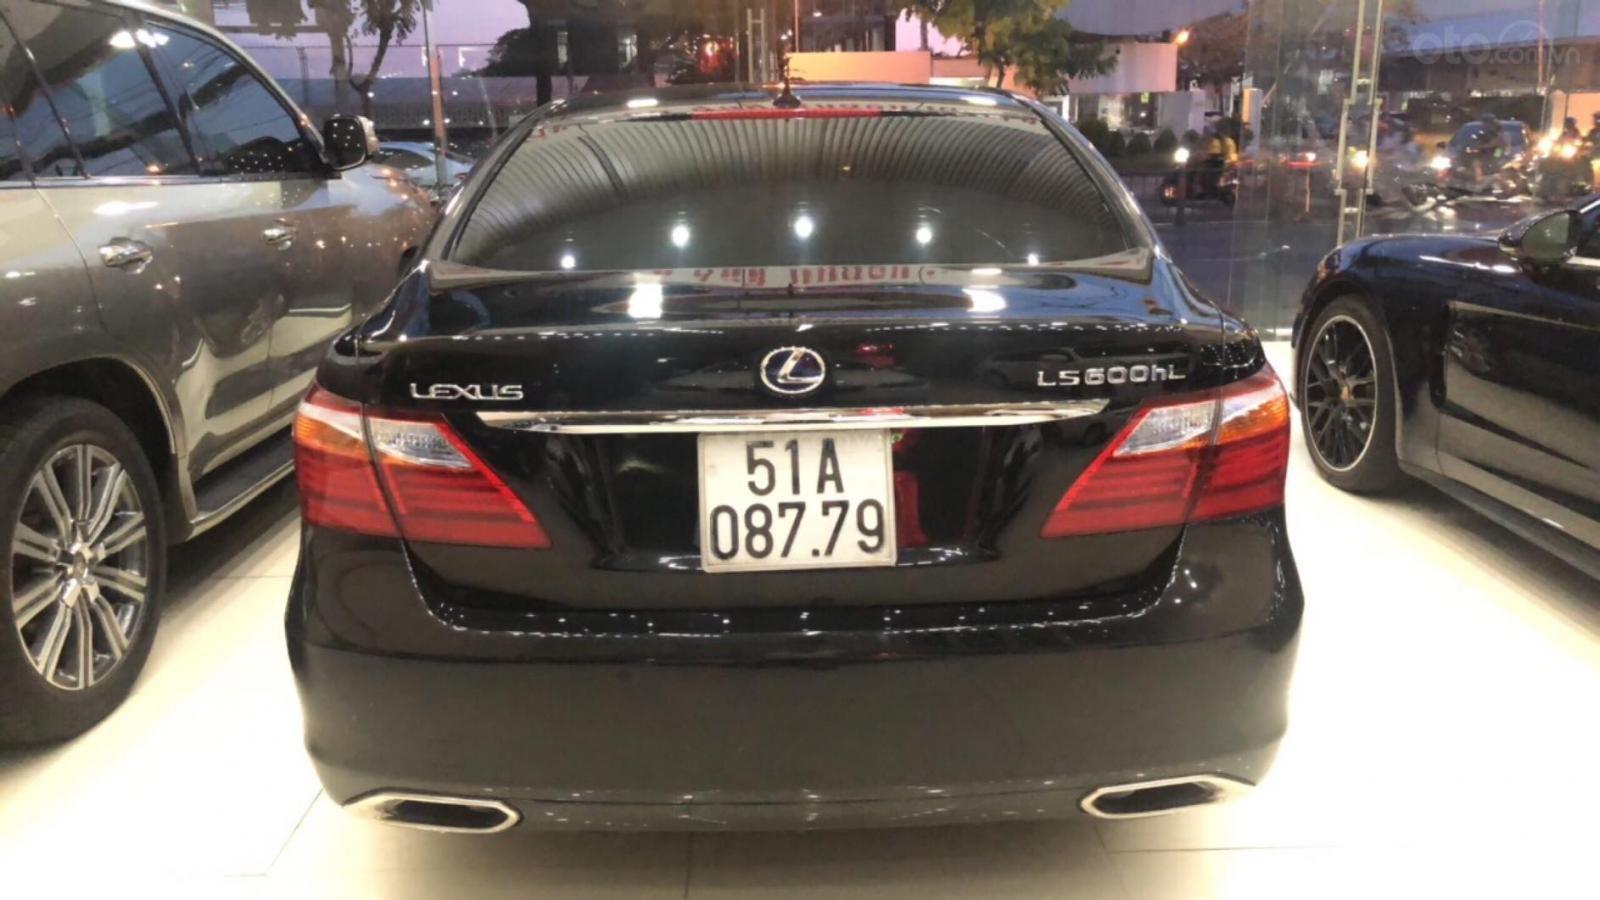 Bán xe Lexus LS600HL SX 2011 (3)